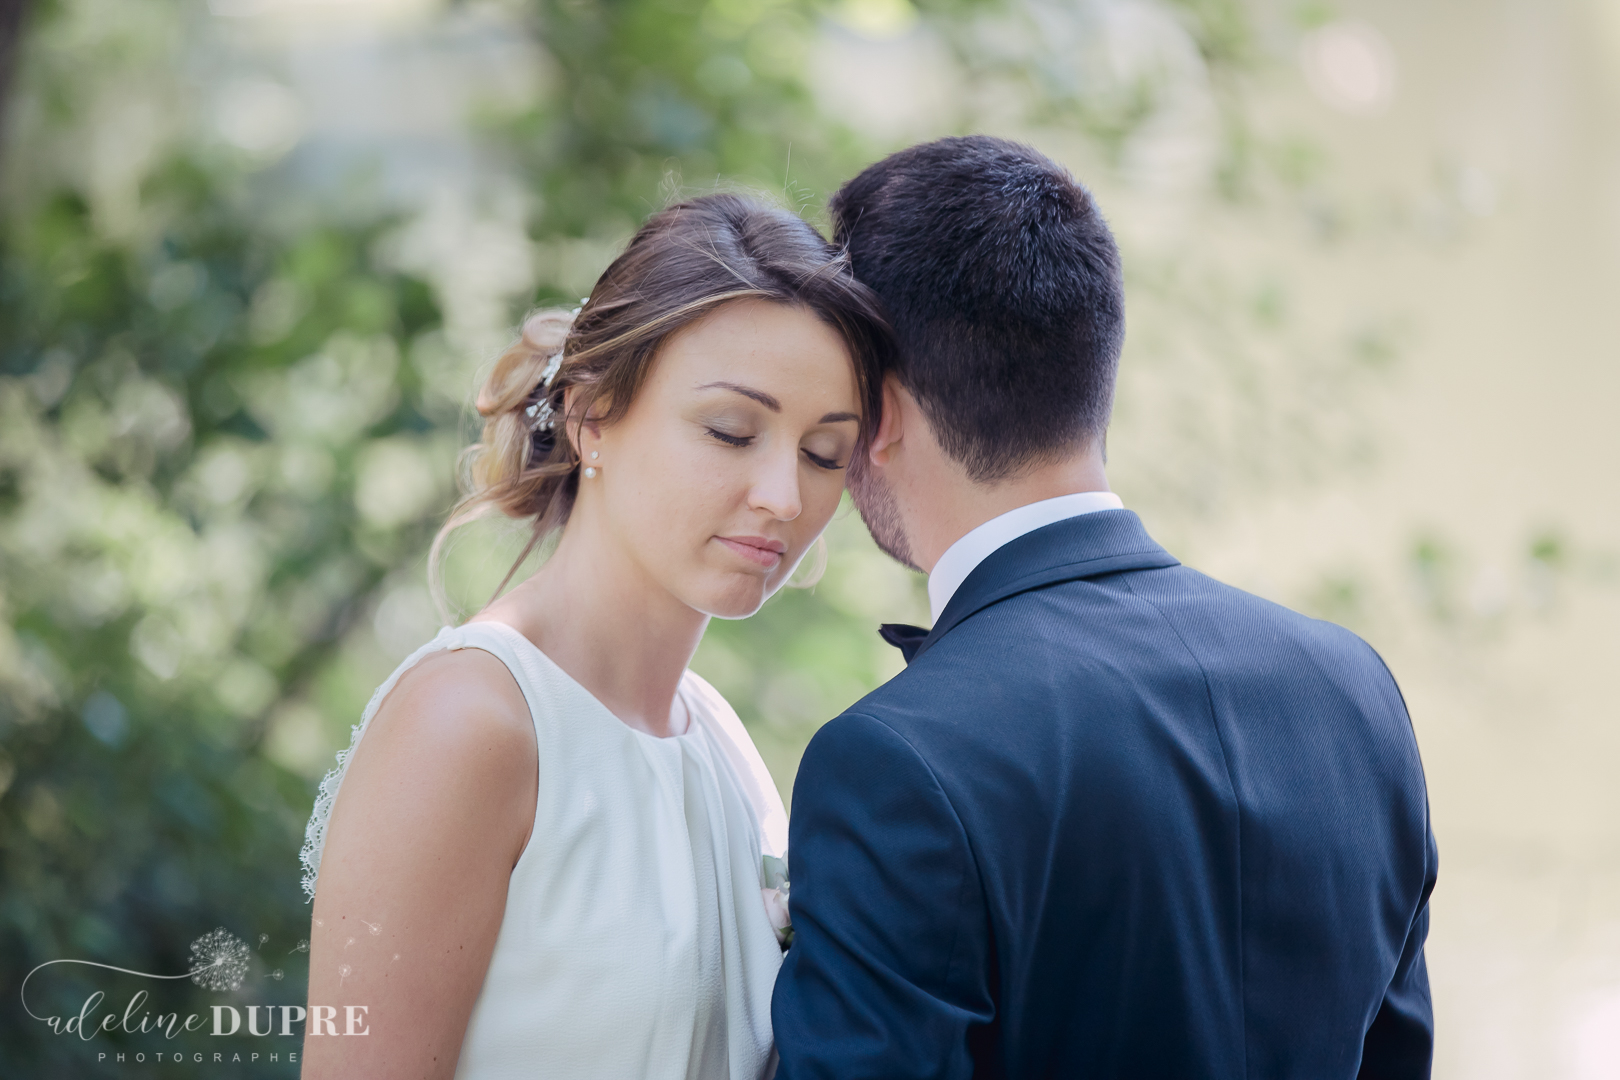 Adeline Dupre Photographe Yonne-1-2